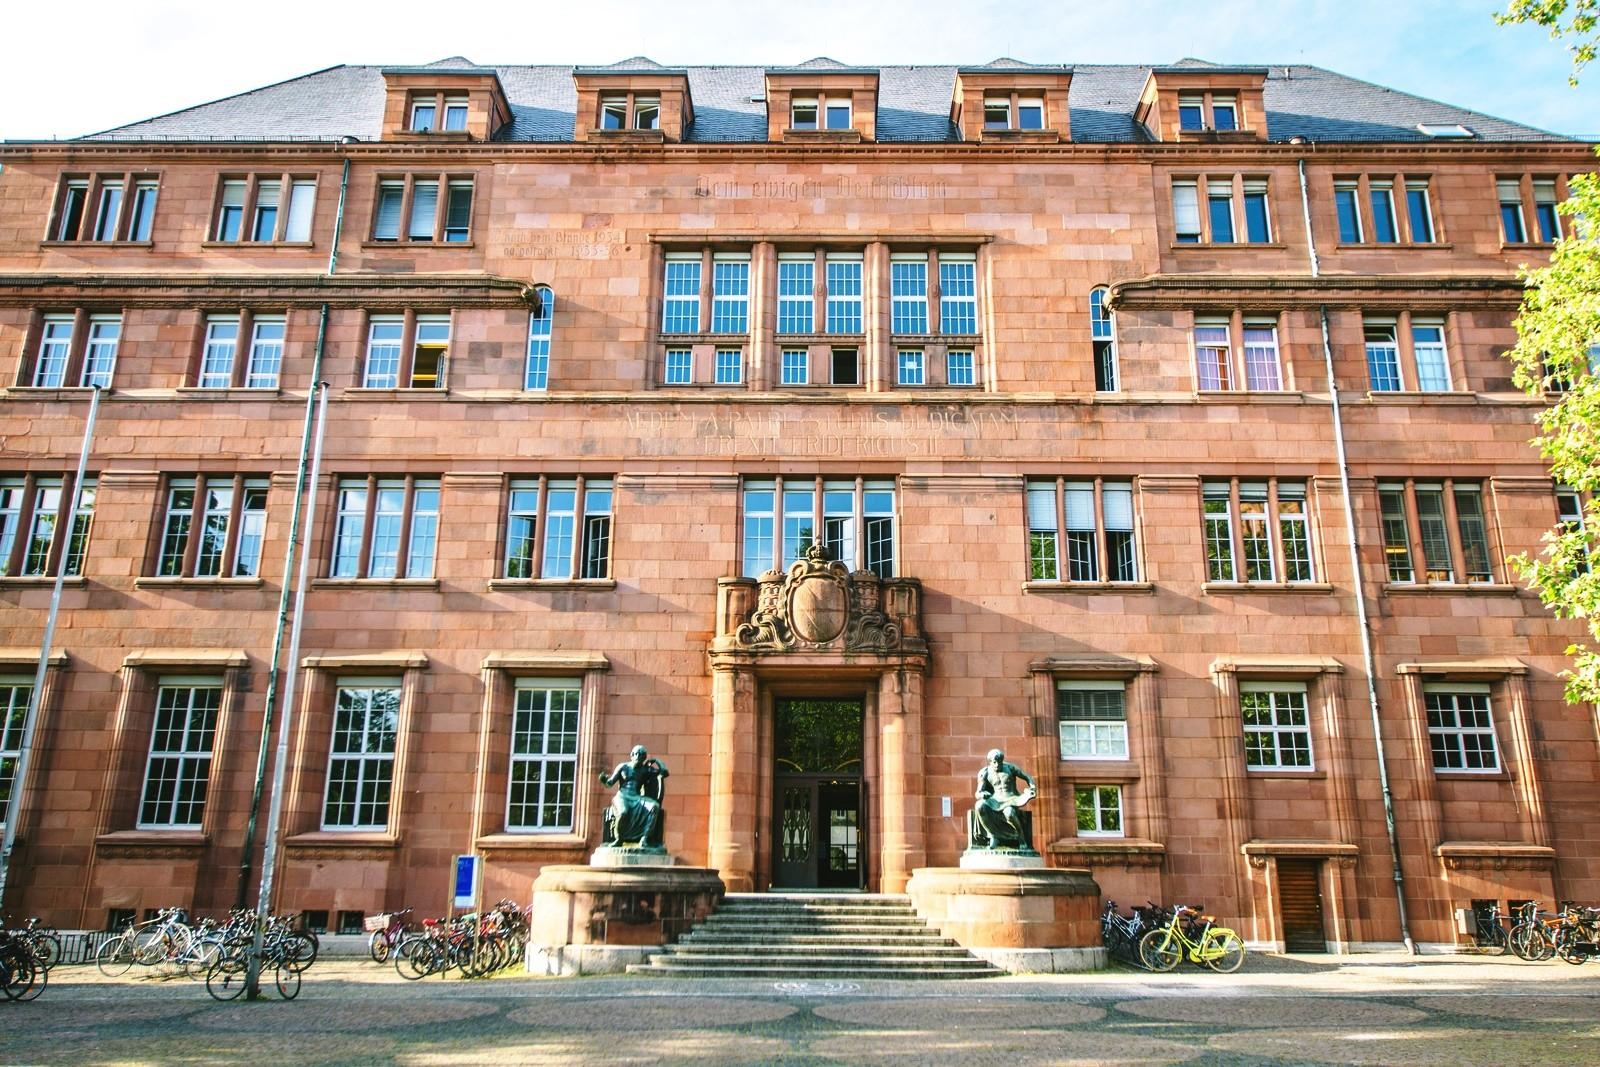 Đại học Freiburg. Ảnh: Wikipedia.